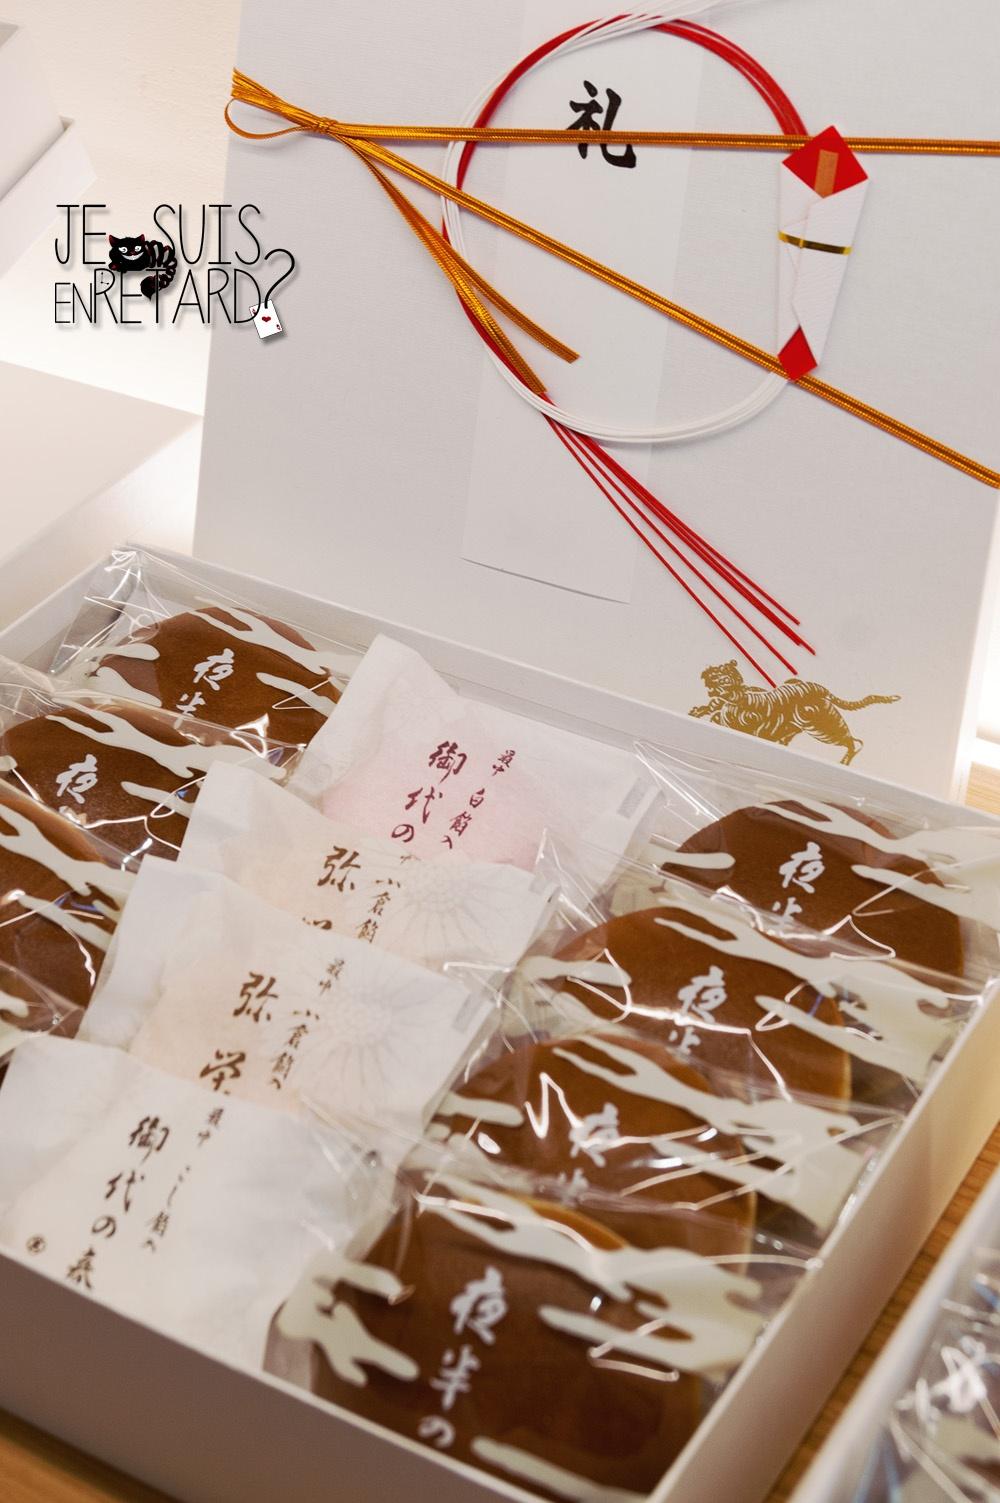 Toraya 1 - Pâtisserie japonaise - pintrerest